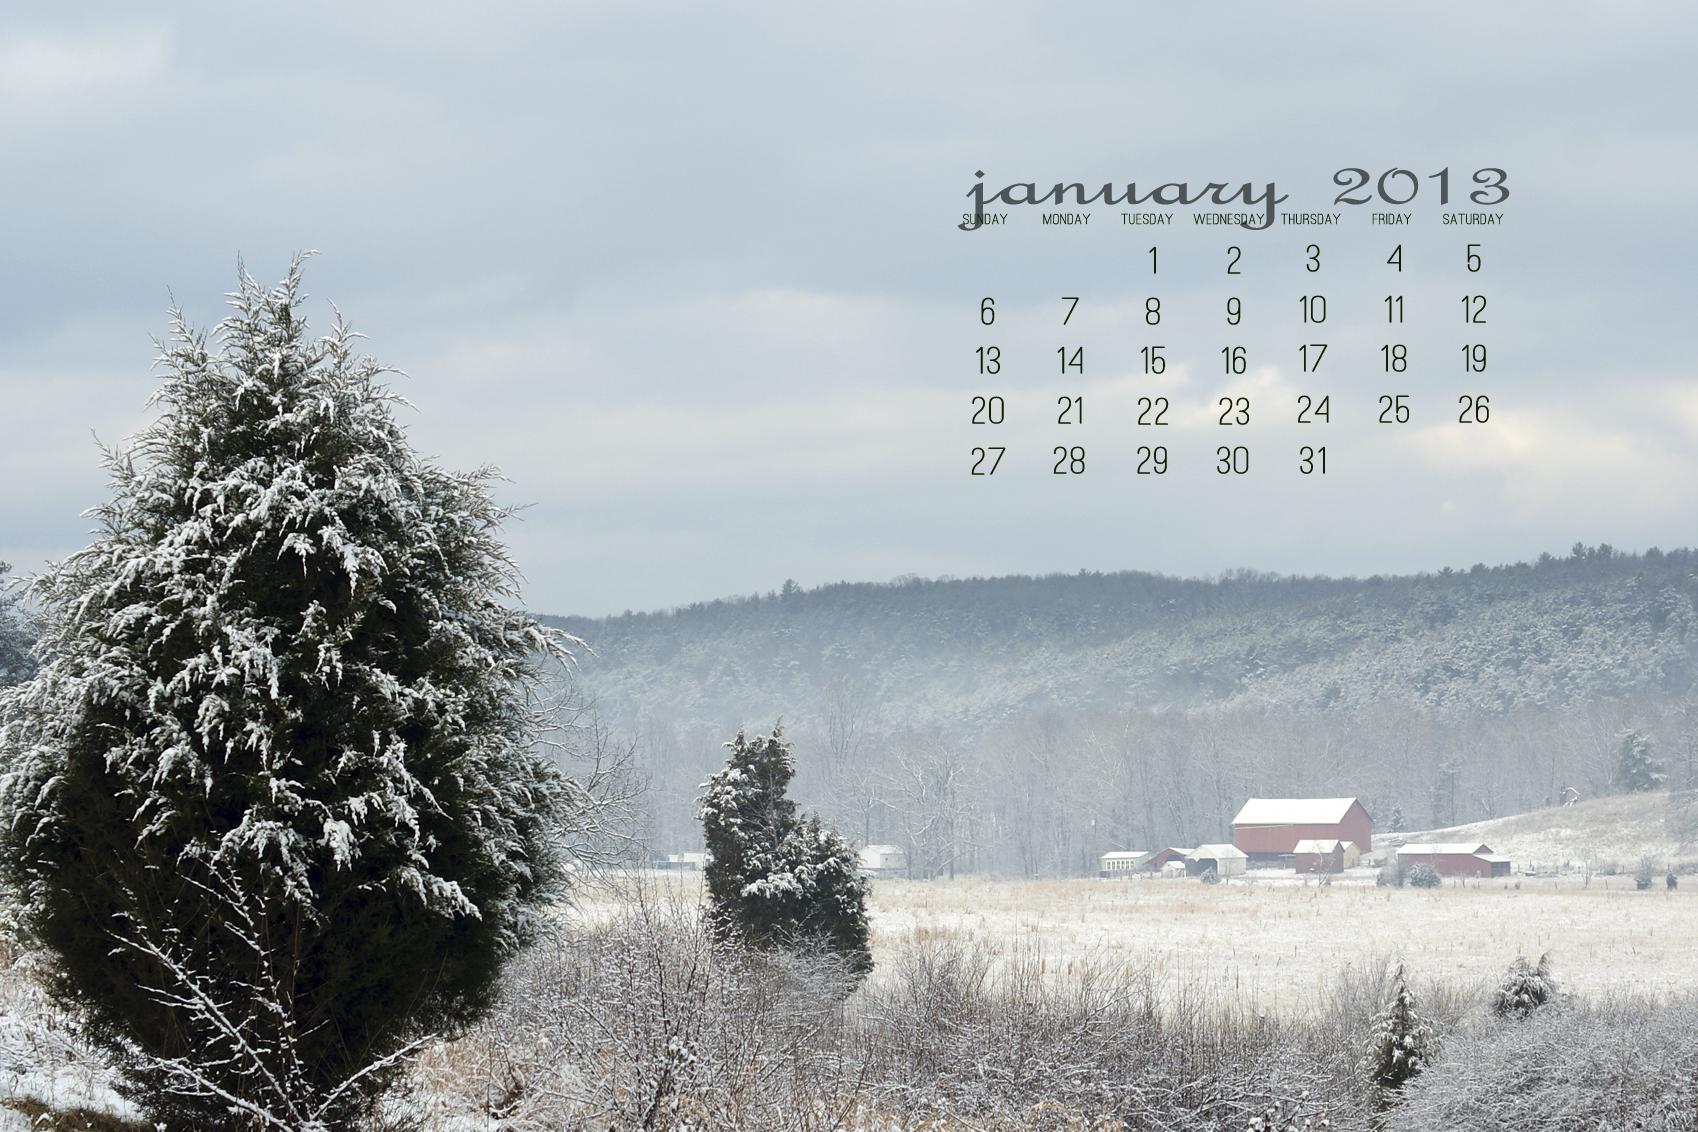 Calendar   Wallpapers Pictures Pics Photos Images Desktop 1698x1132